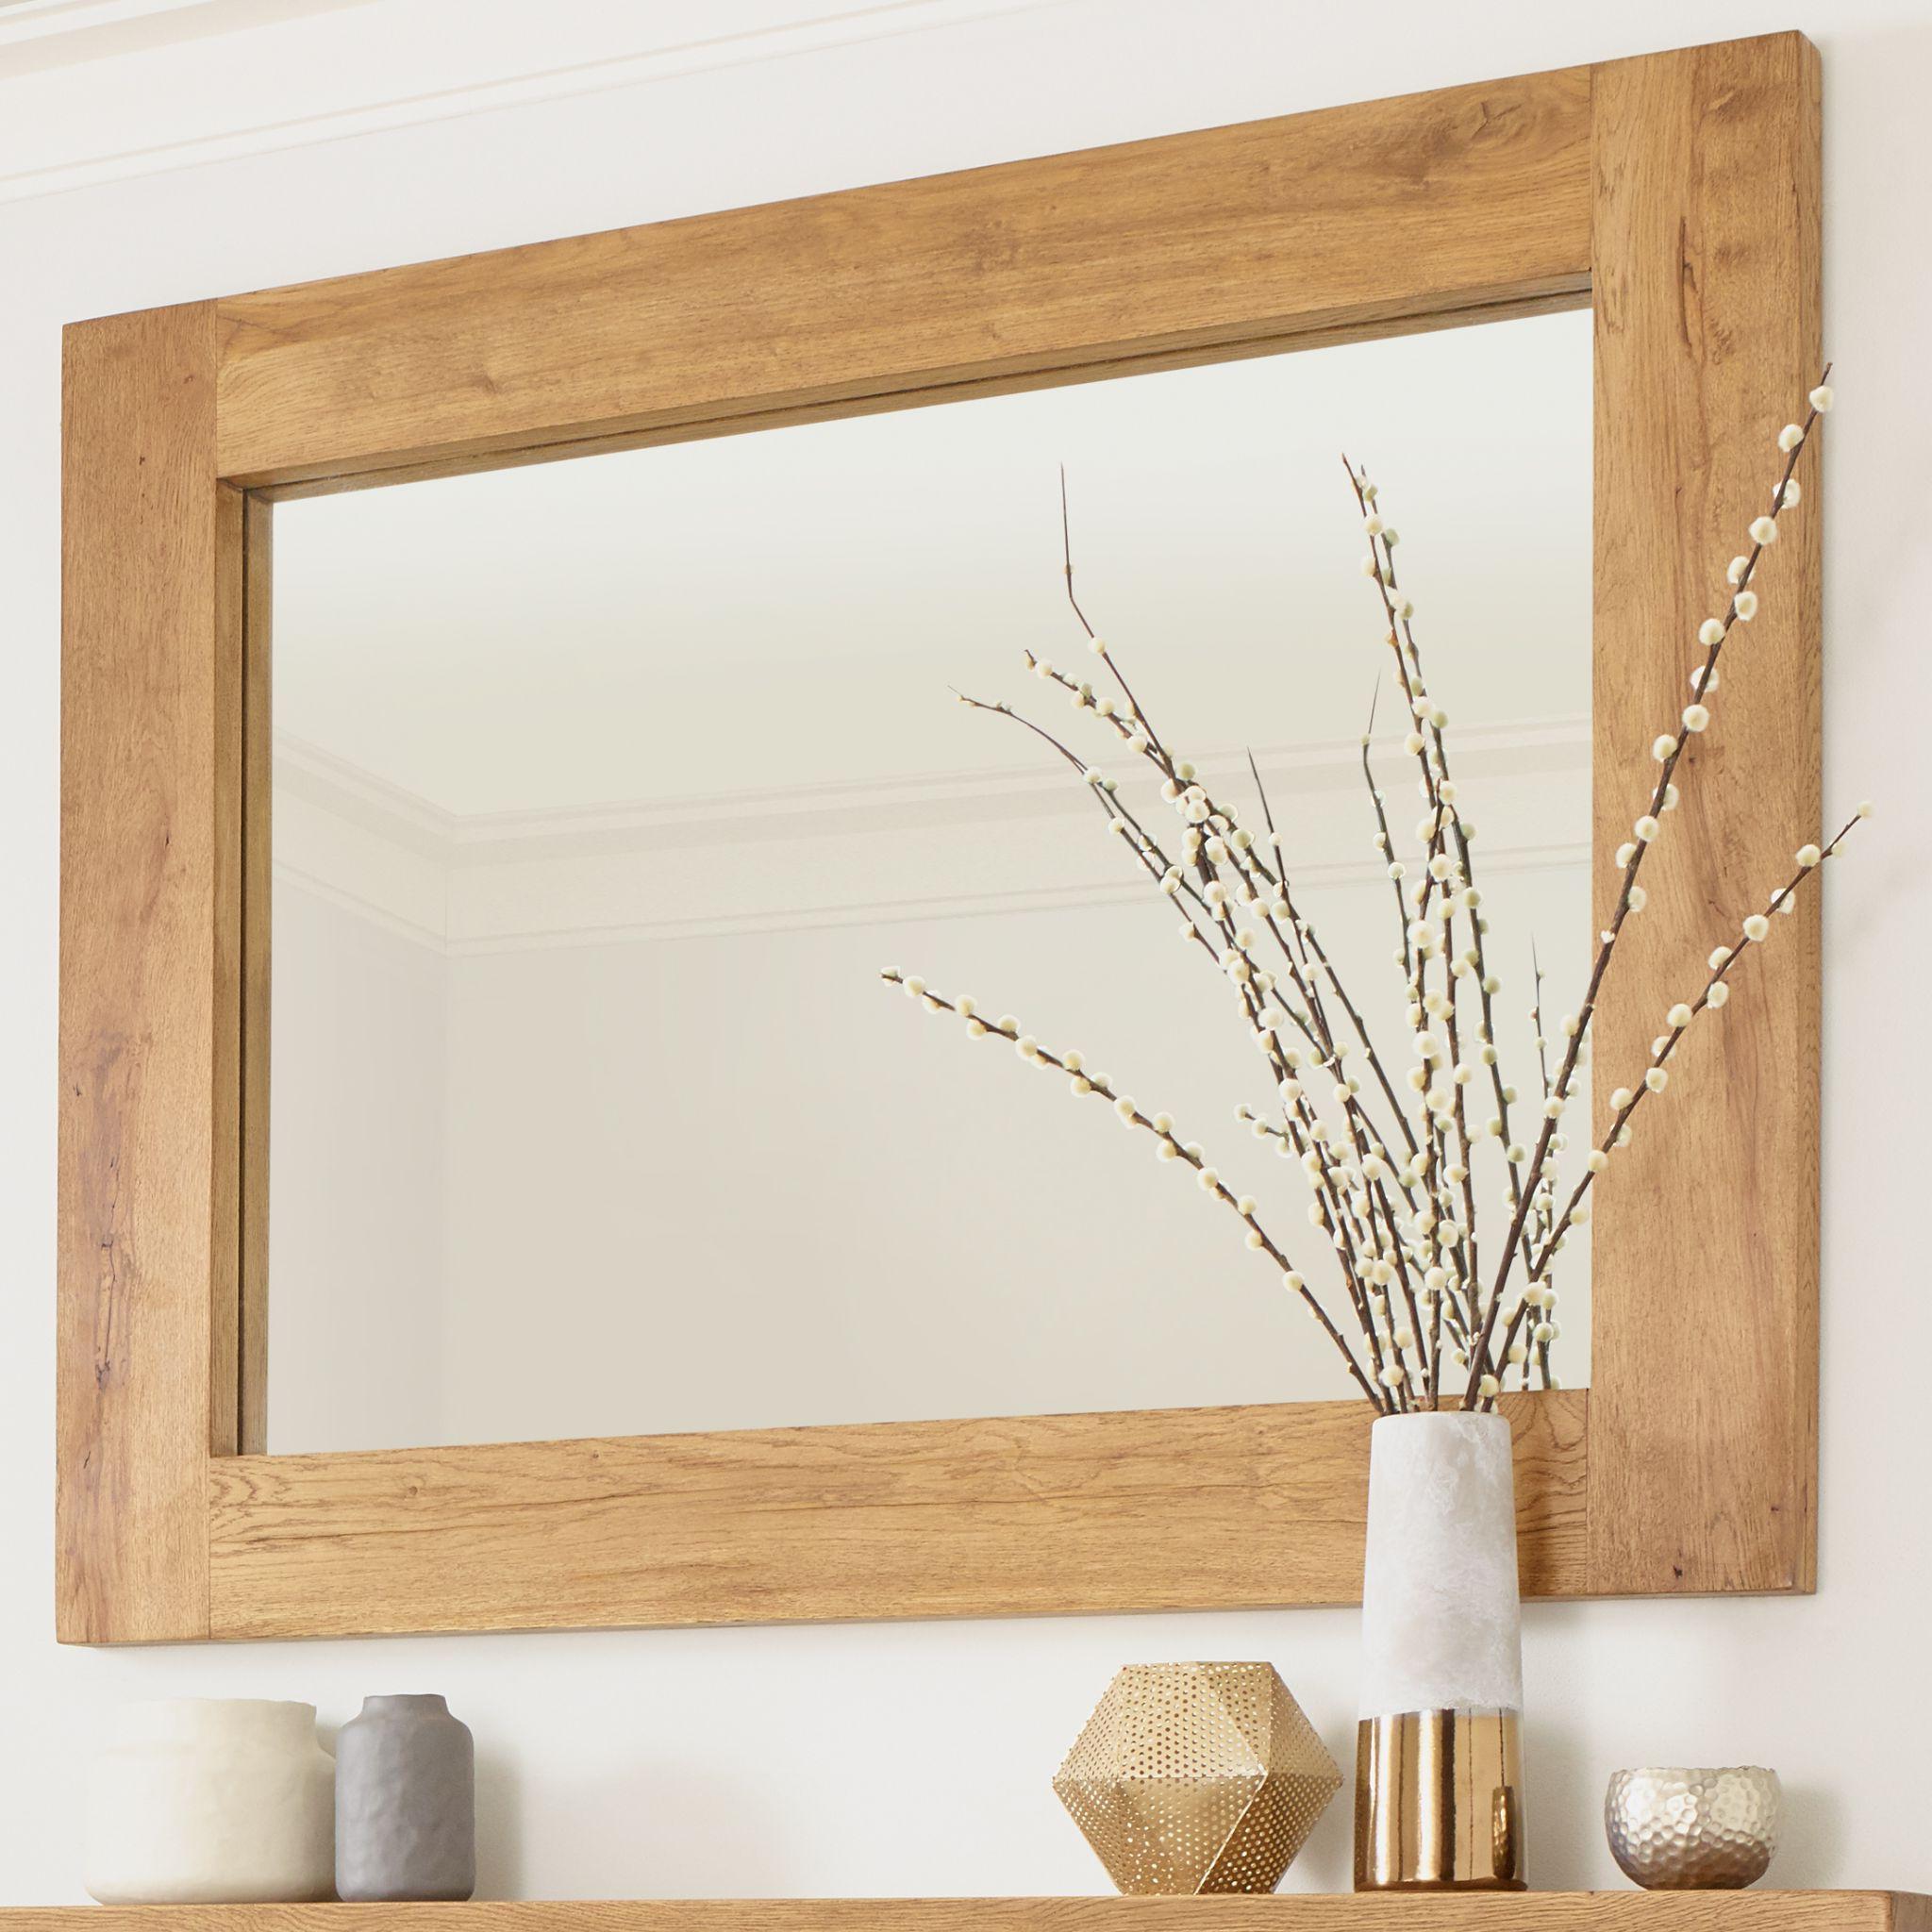 Recent Oak Wall Mirrors Regarding Solid Oak Banbury Wall Mirror Rustic Character (View 12 of 20)